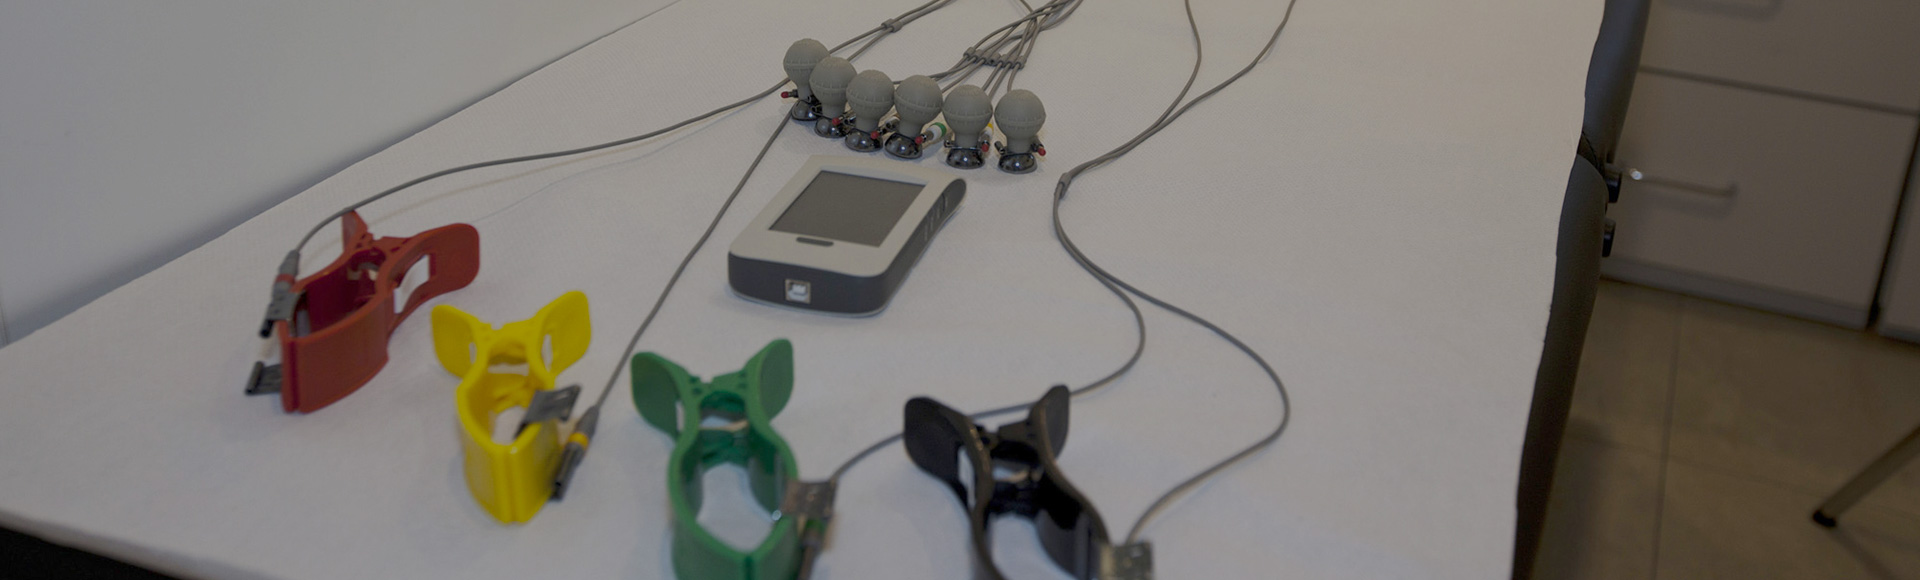 Elettrocardiogramma o ECG - Farmacia Morlotti